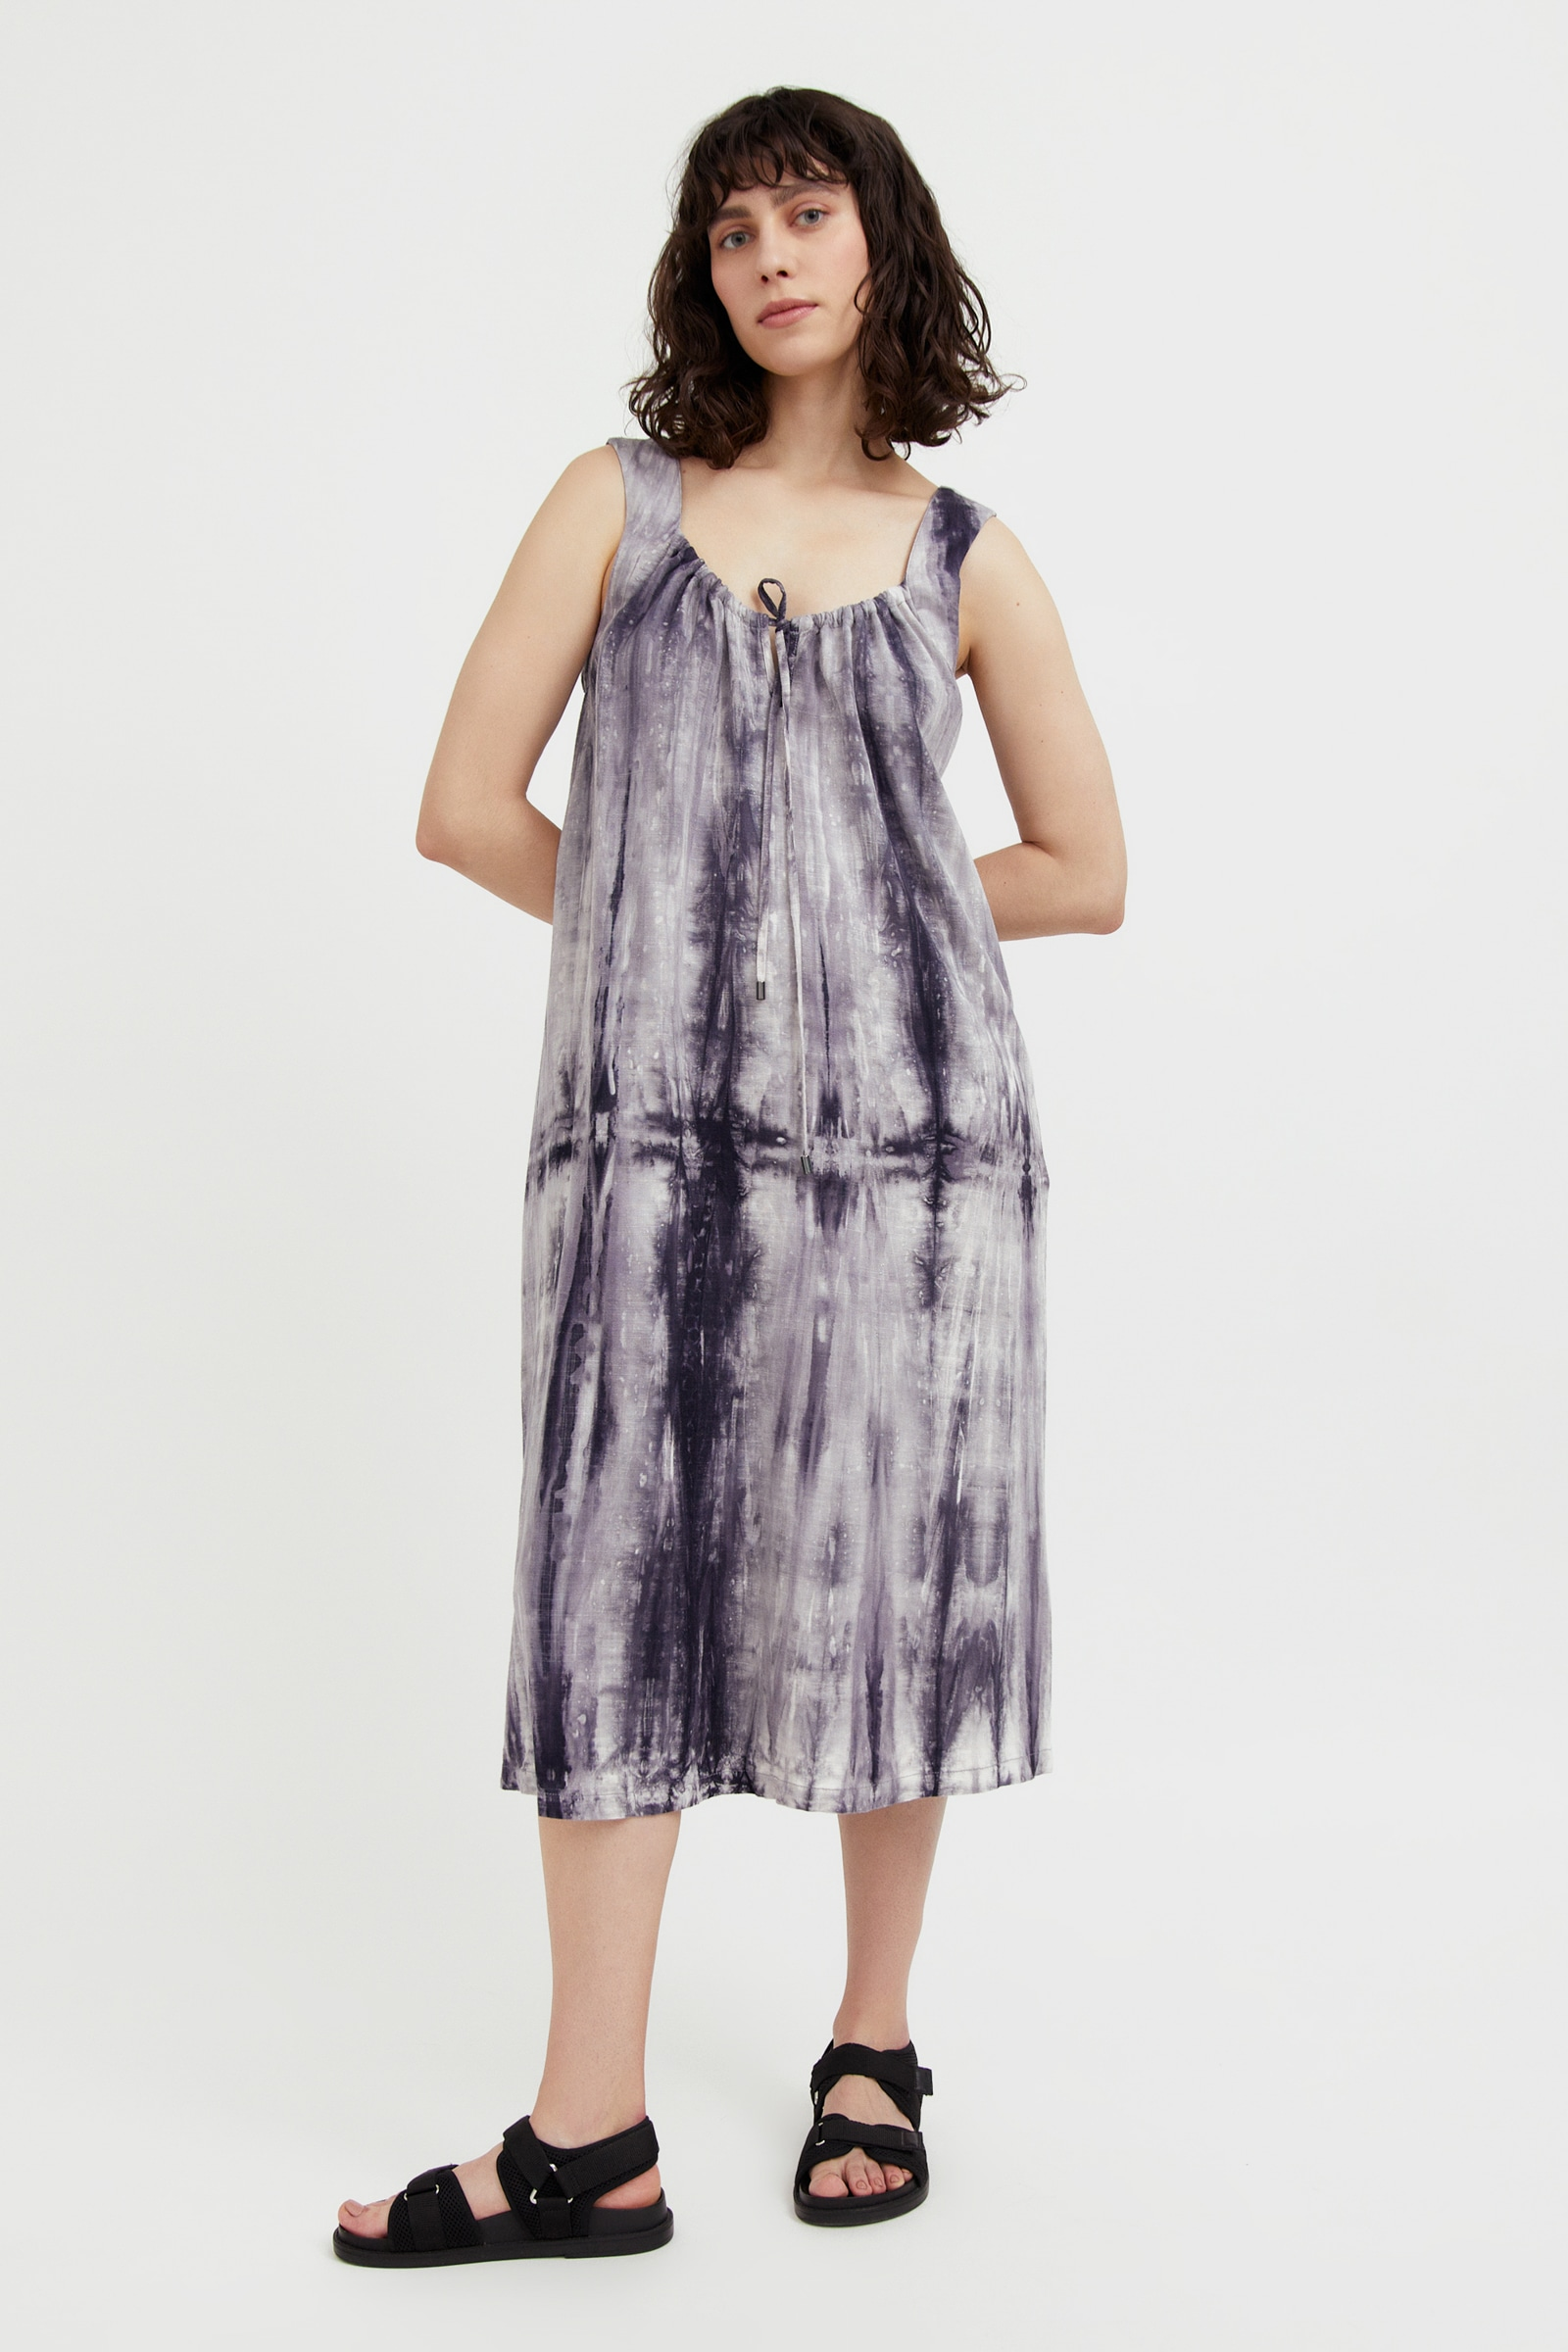 finn flare -  Jerseykleid, im auffälligen Batik-Look